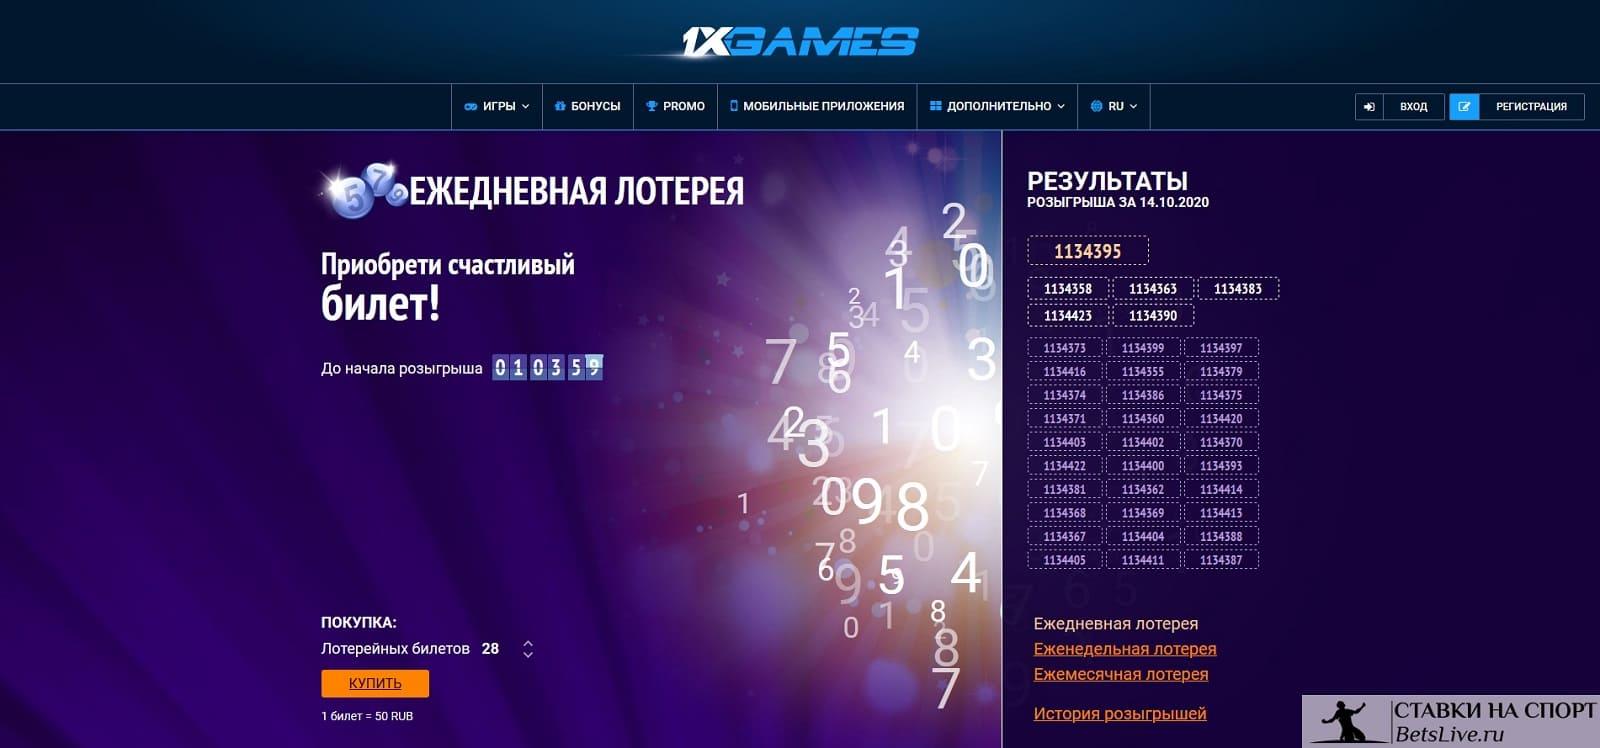 Ежедневная лотерея 1xgames